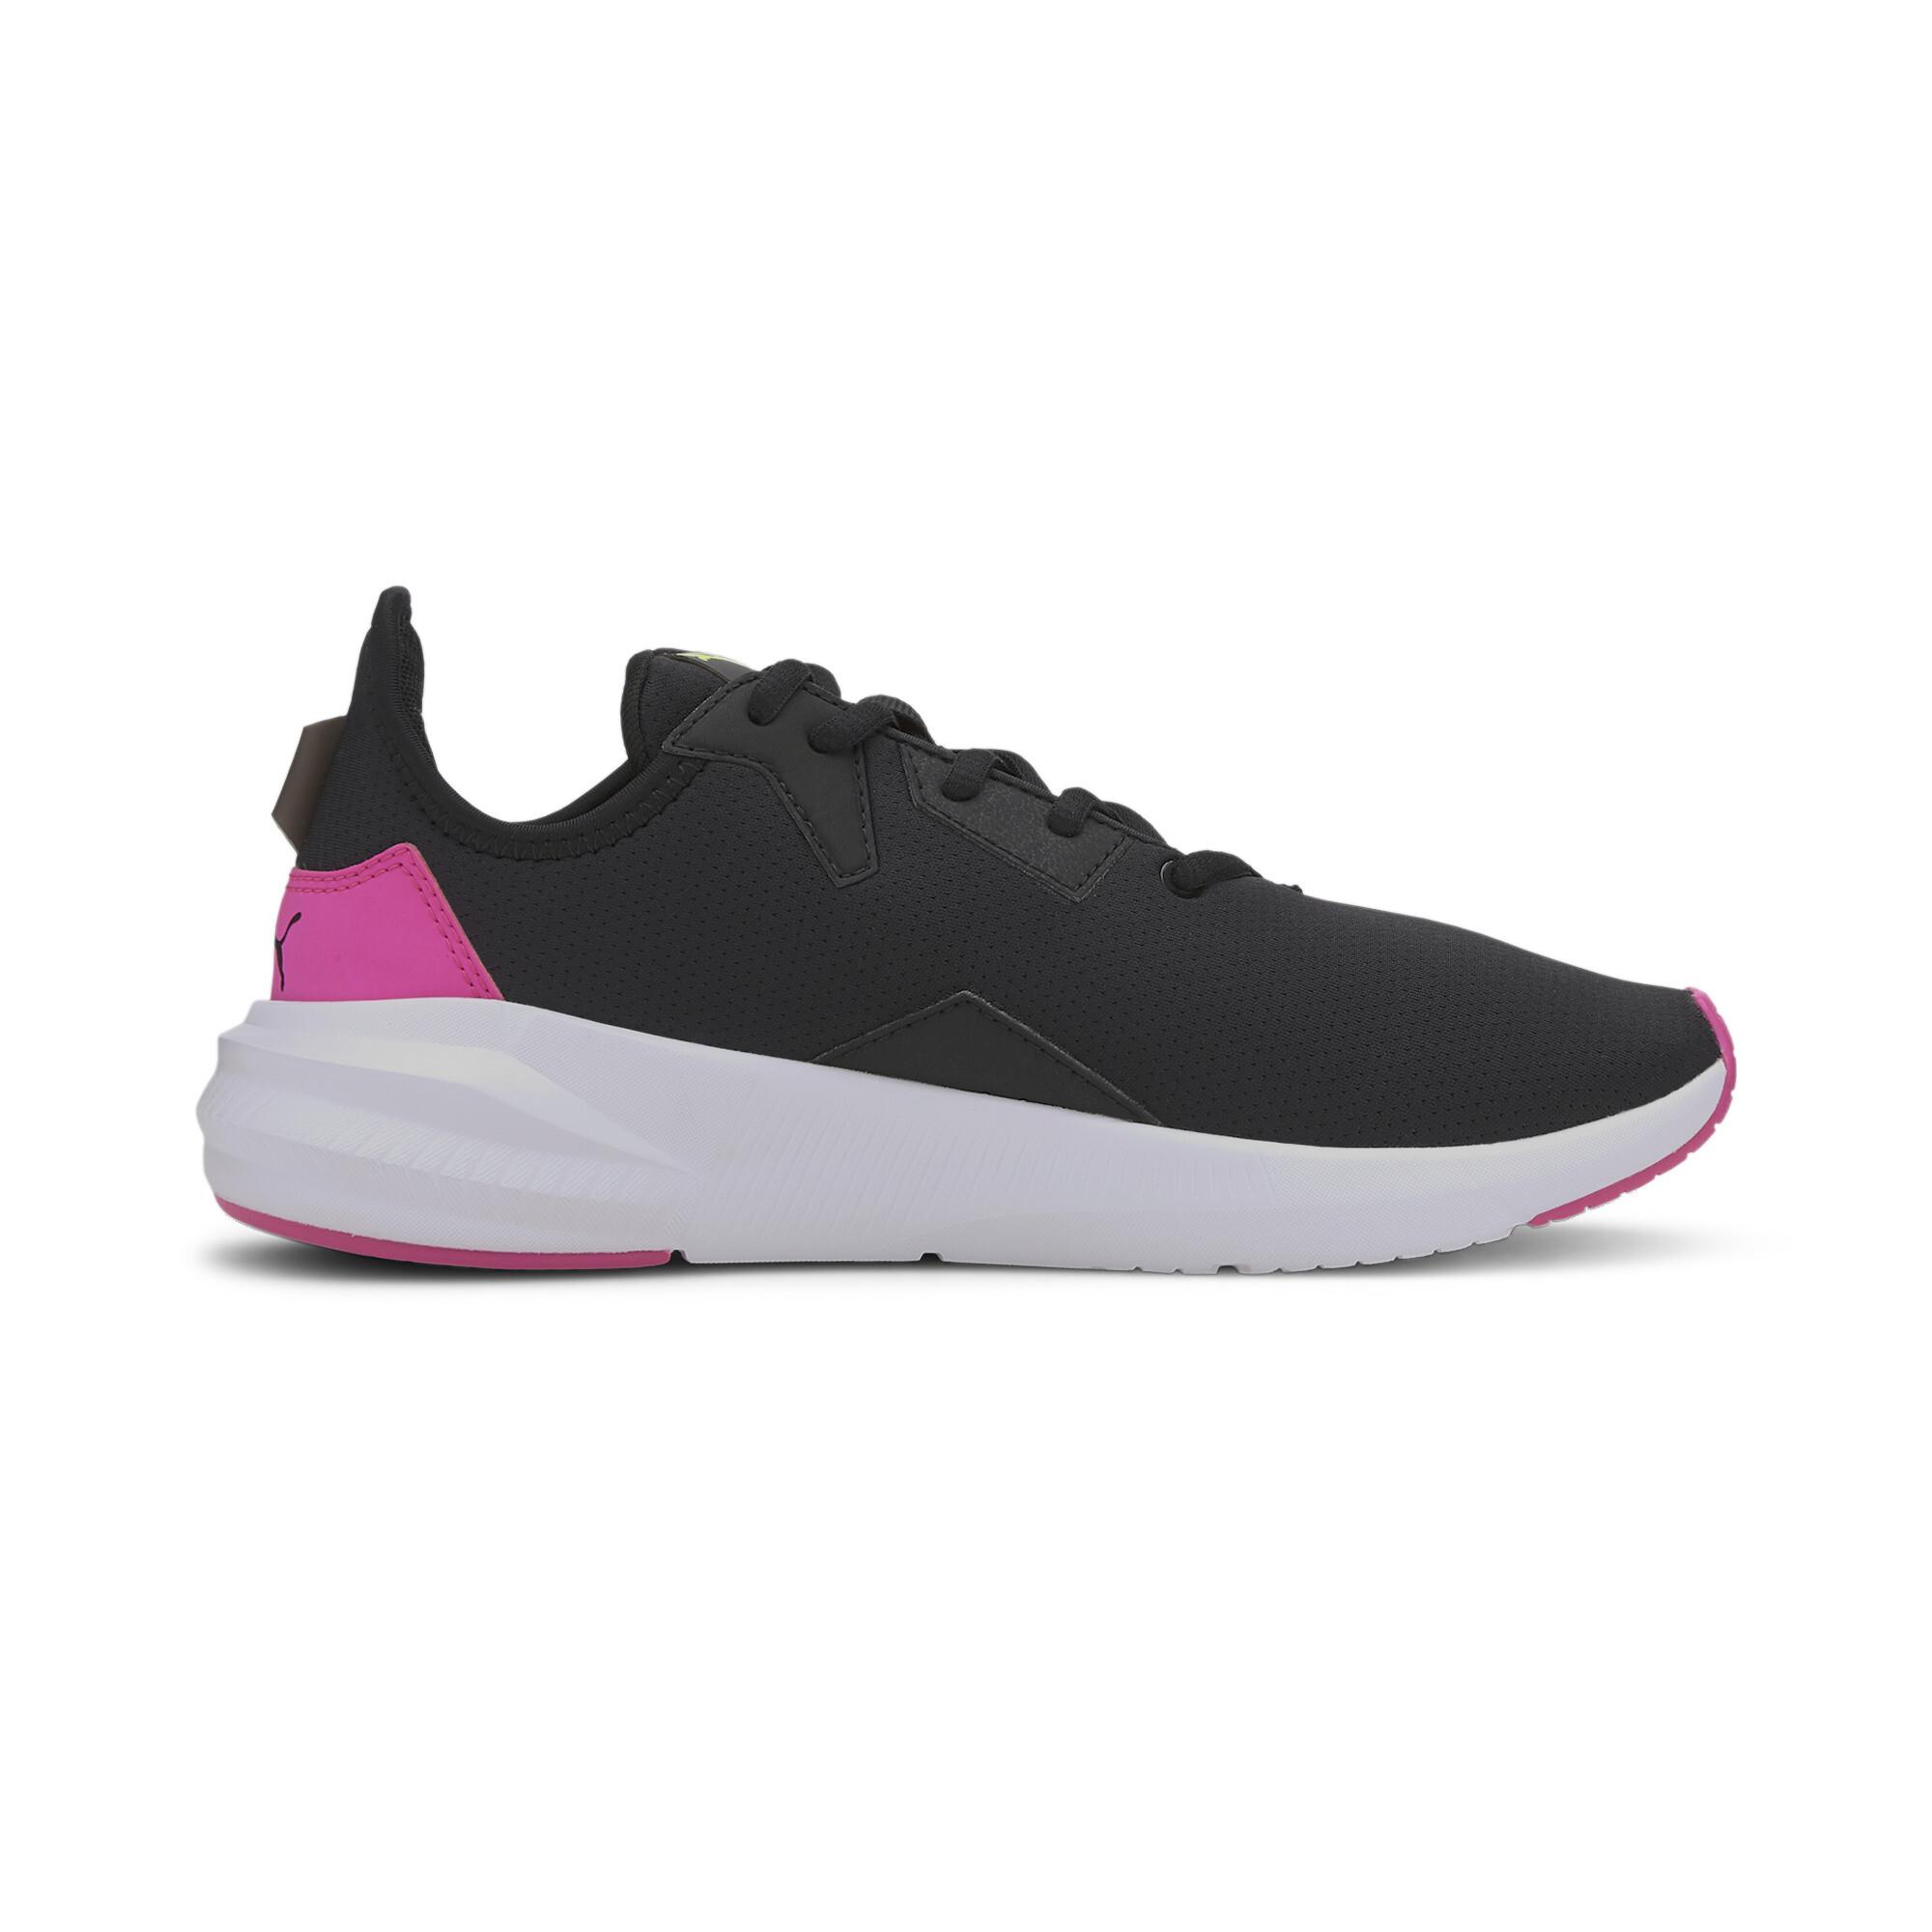 thumbnail 7 - PUMA-Women-039-s-Platinum-Training-Shoes